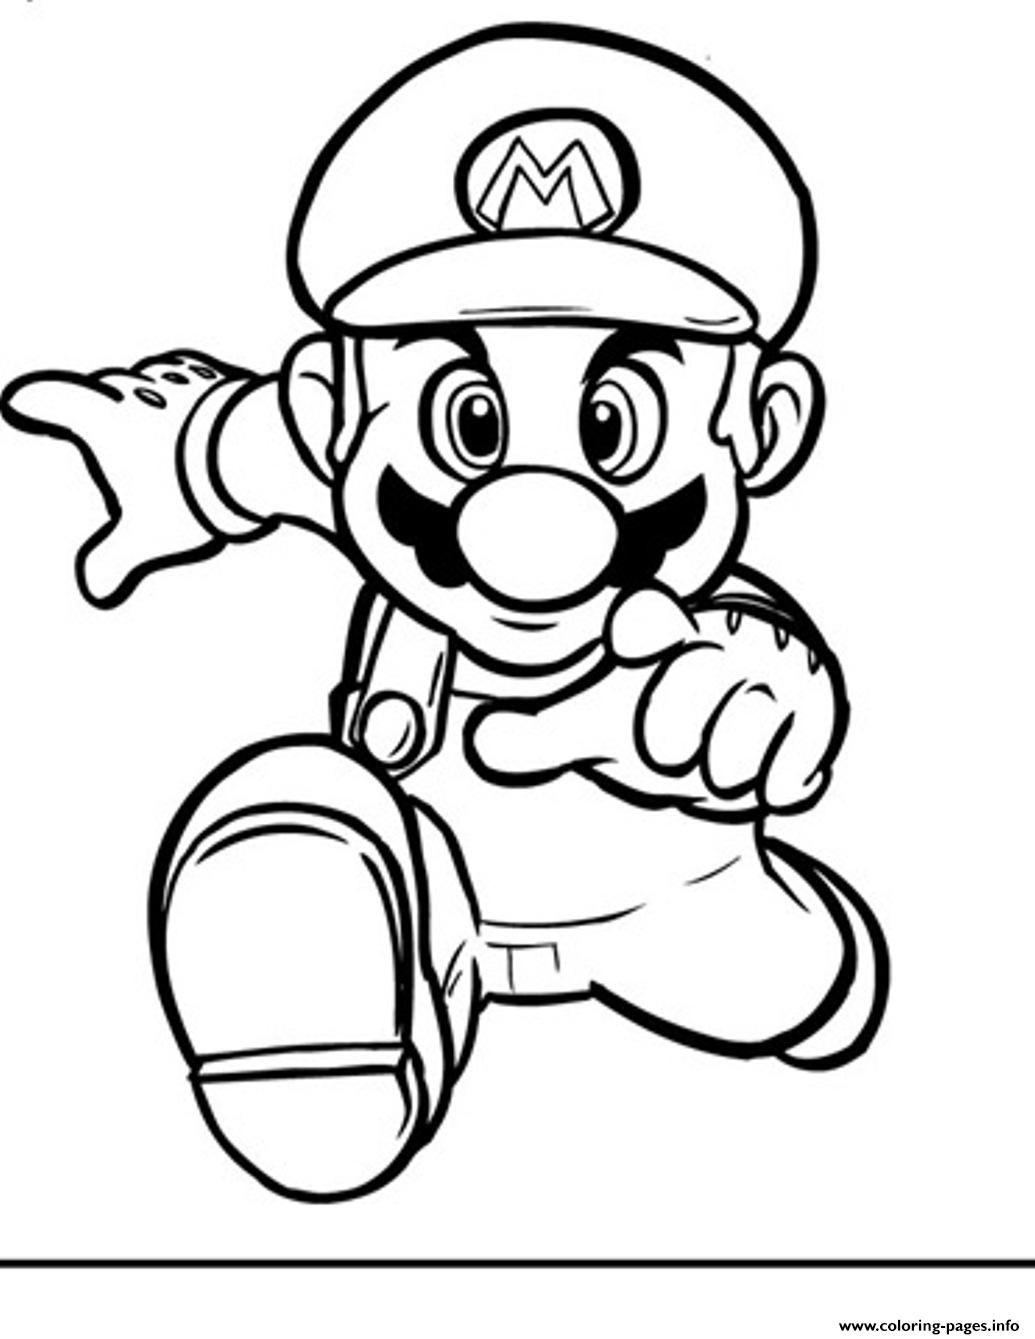 Print Running Mario Bros S2394 Coloring Pages | Mario